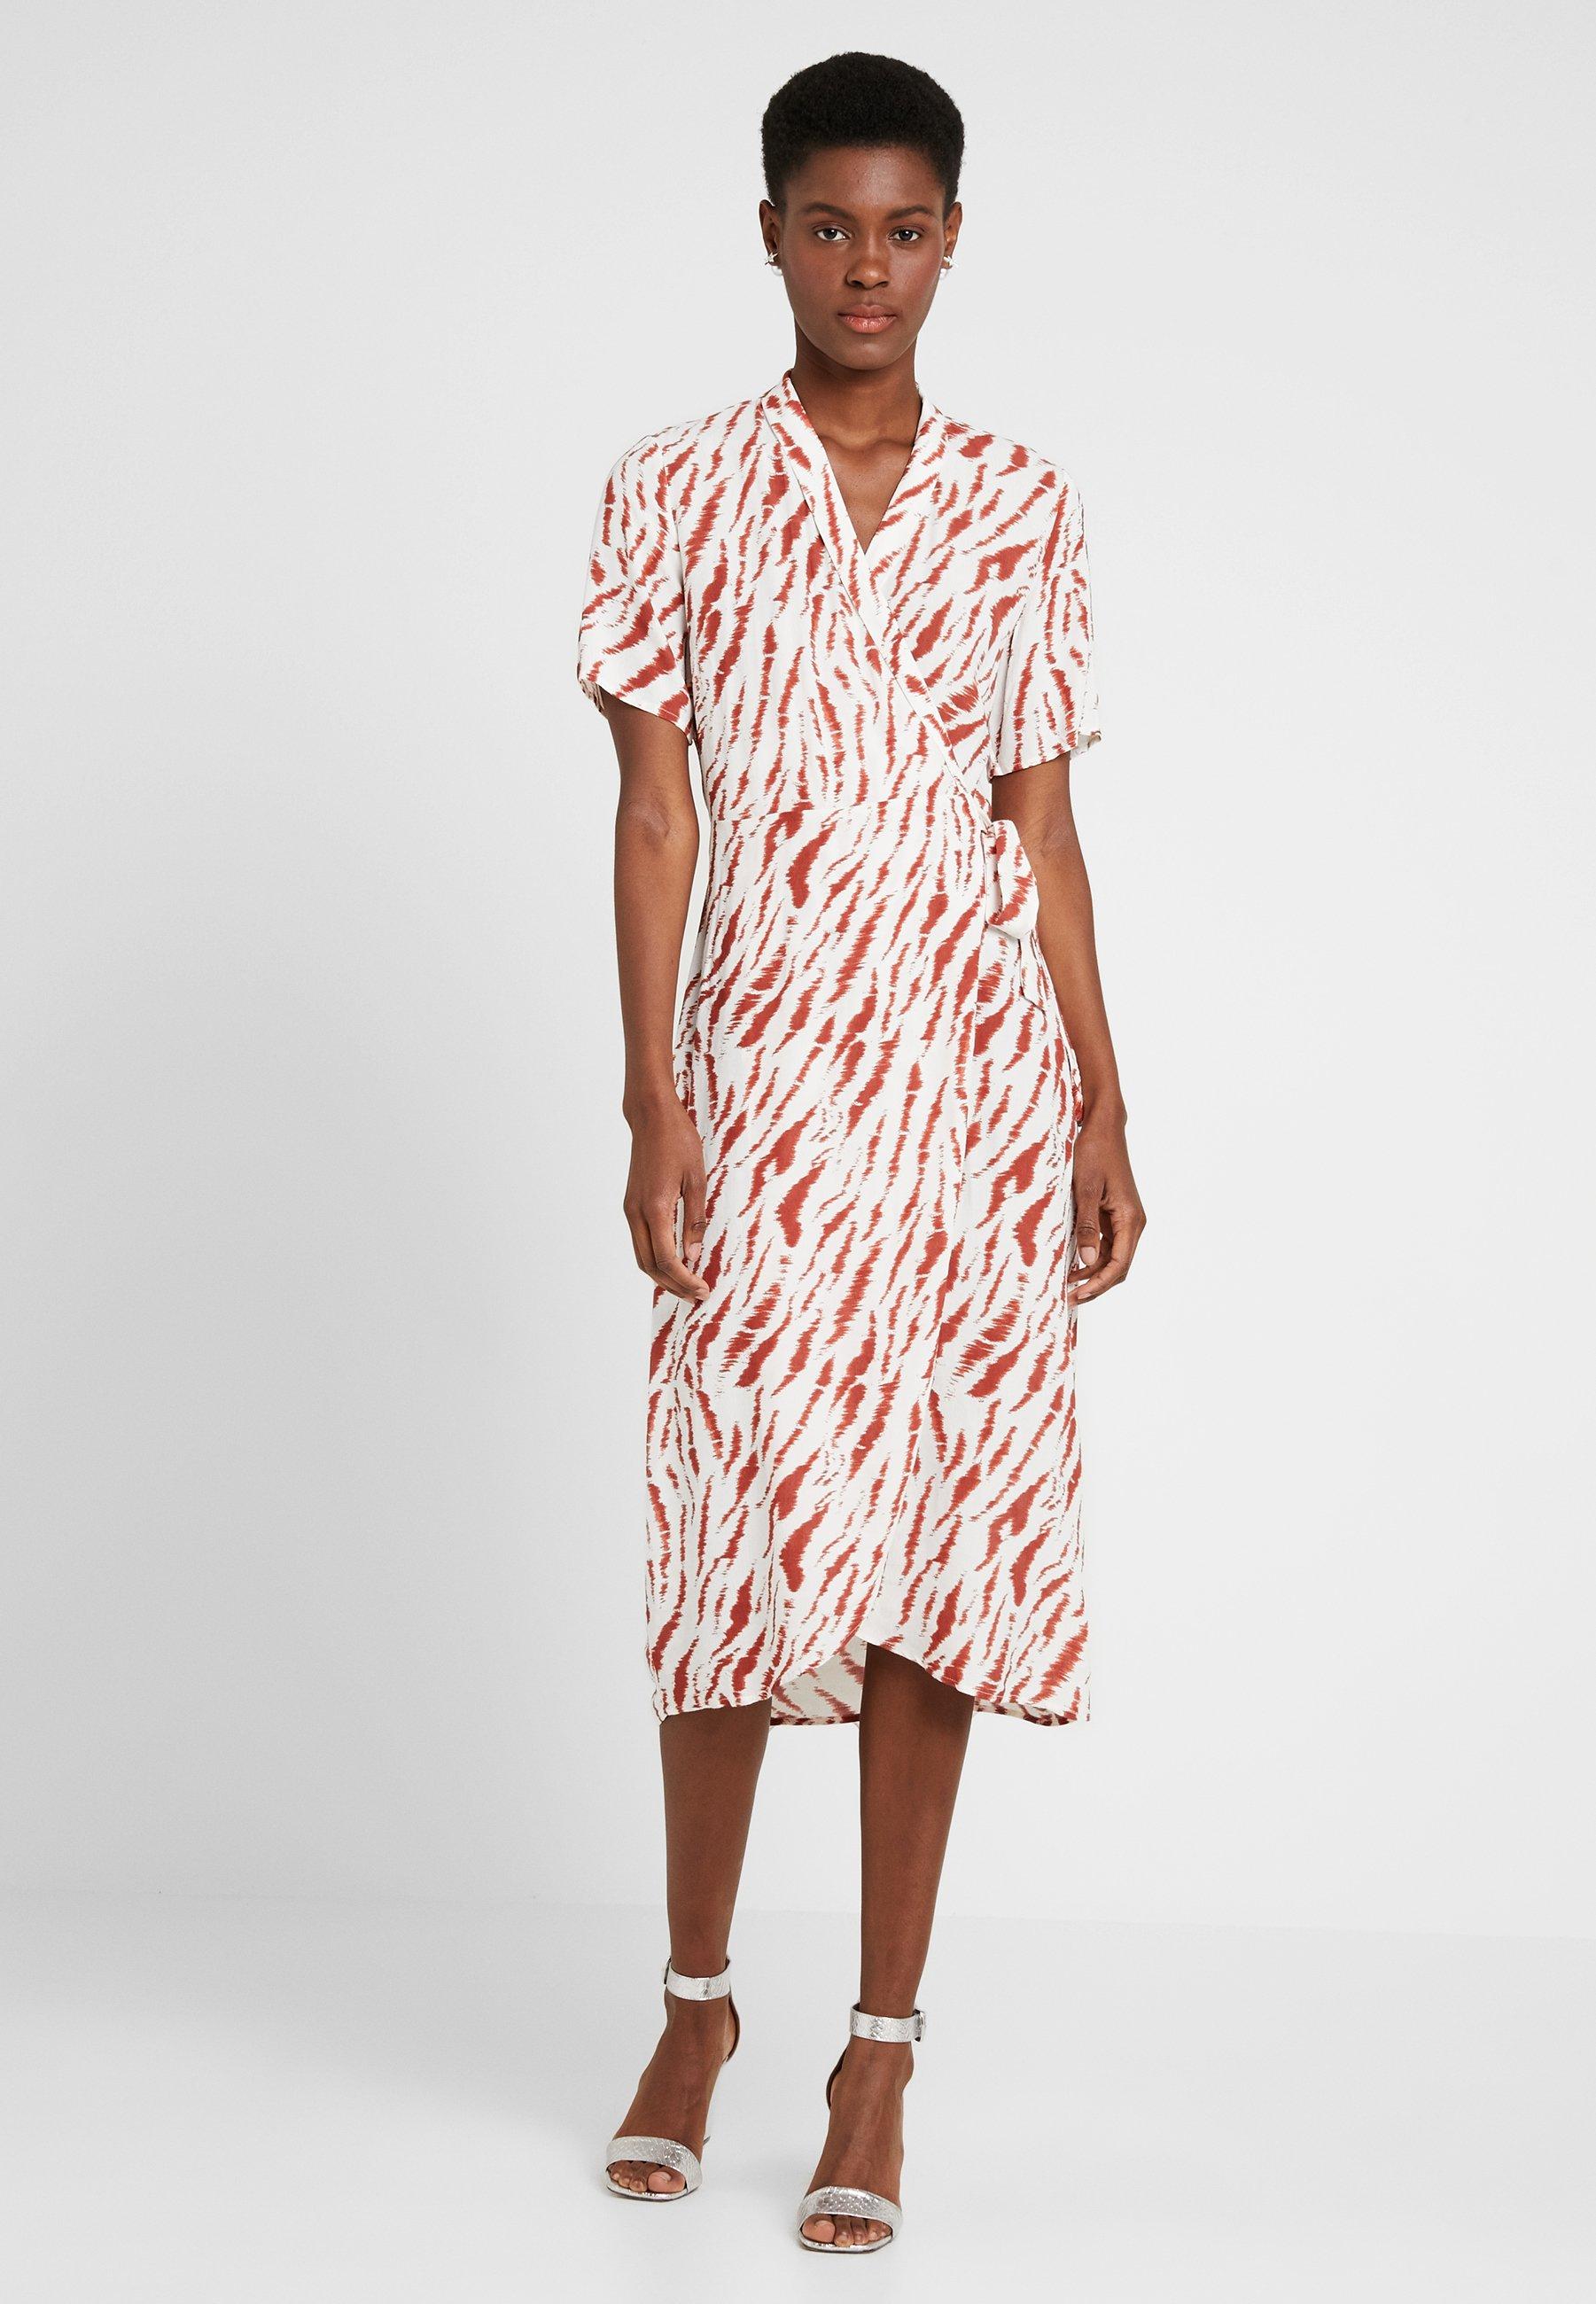 White Longue Bright Pceyva DressRobe Pieces Wrap Tall redwood QCsthrdx